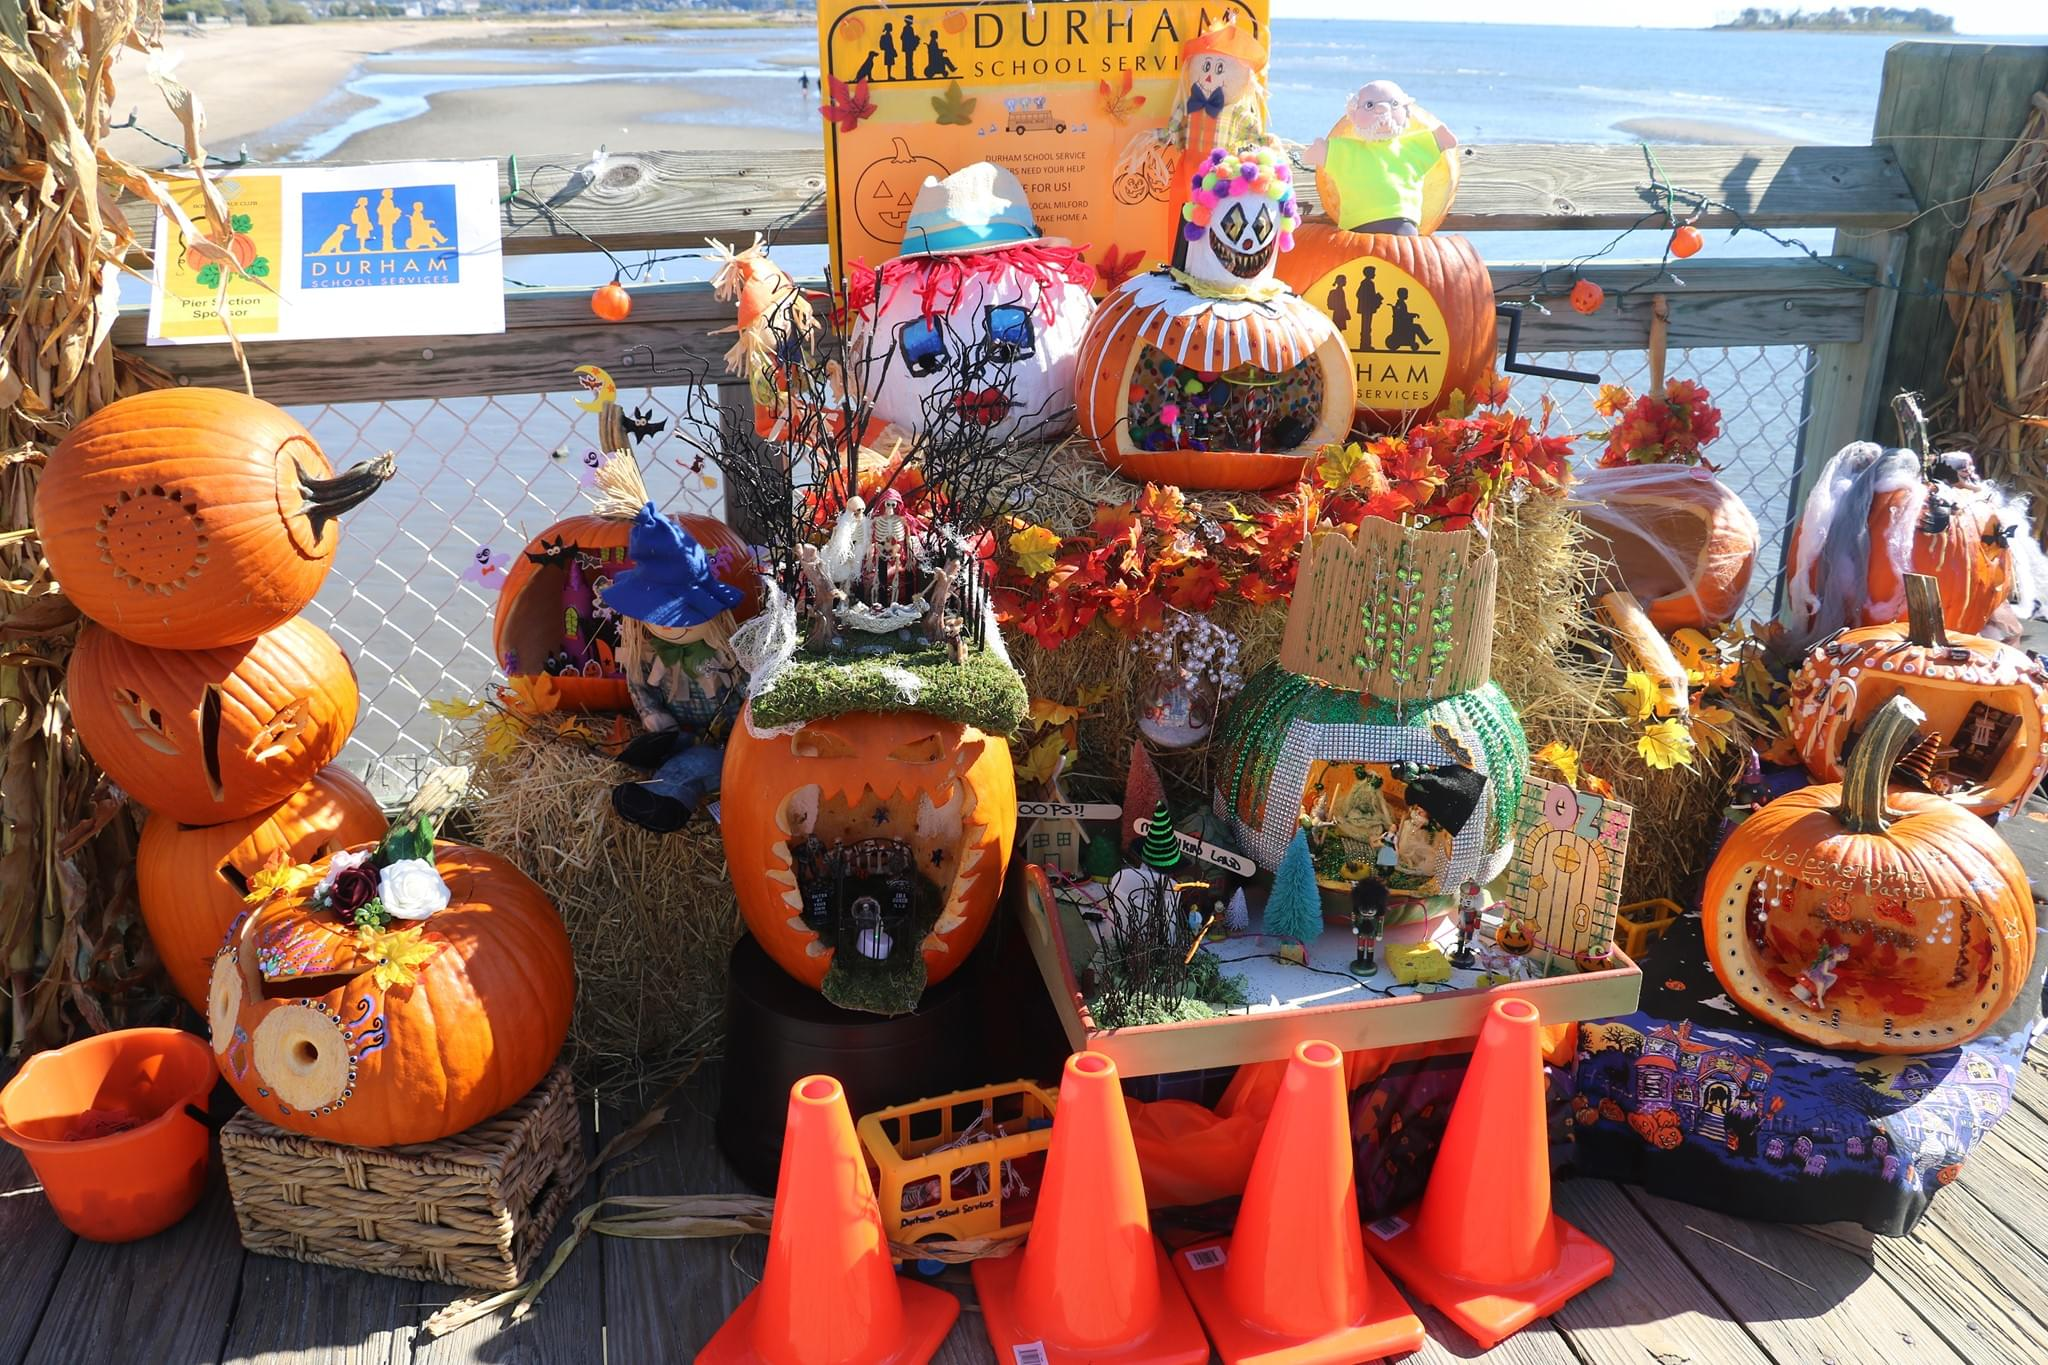 Milford Boys & Girls Club Pumpkins on the Pier